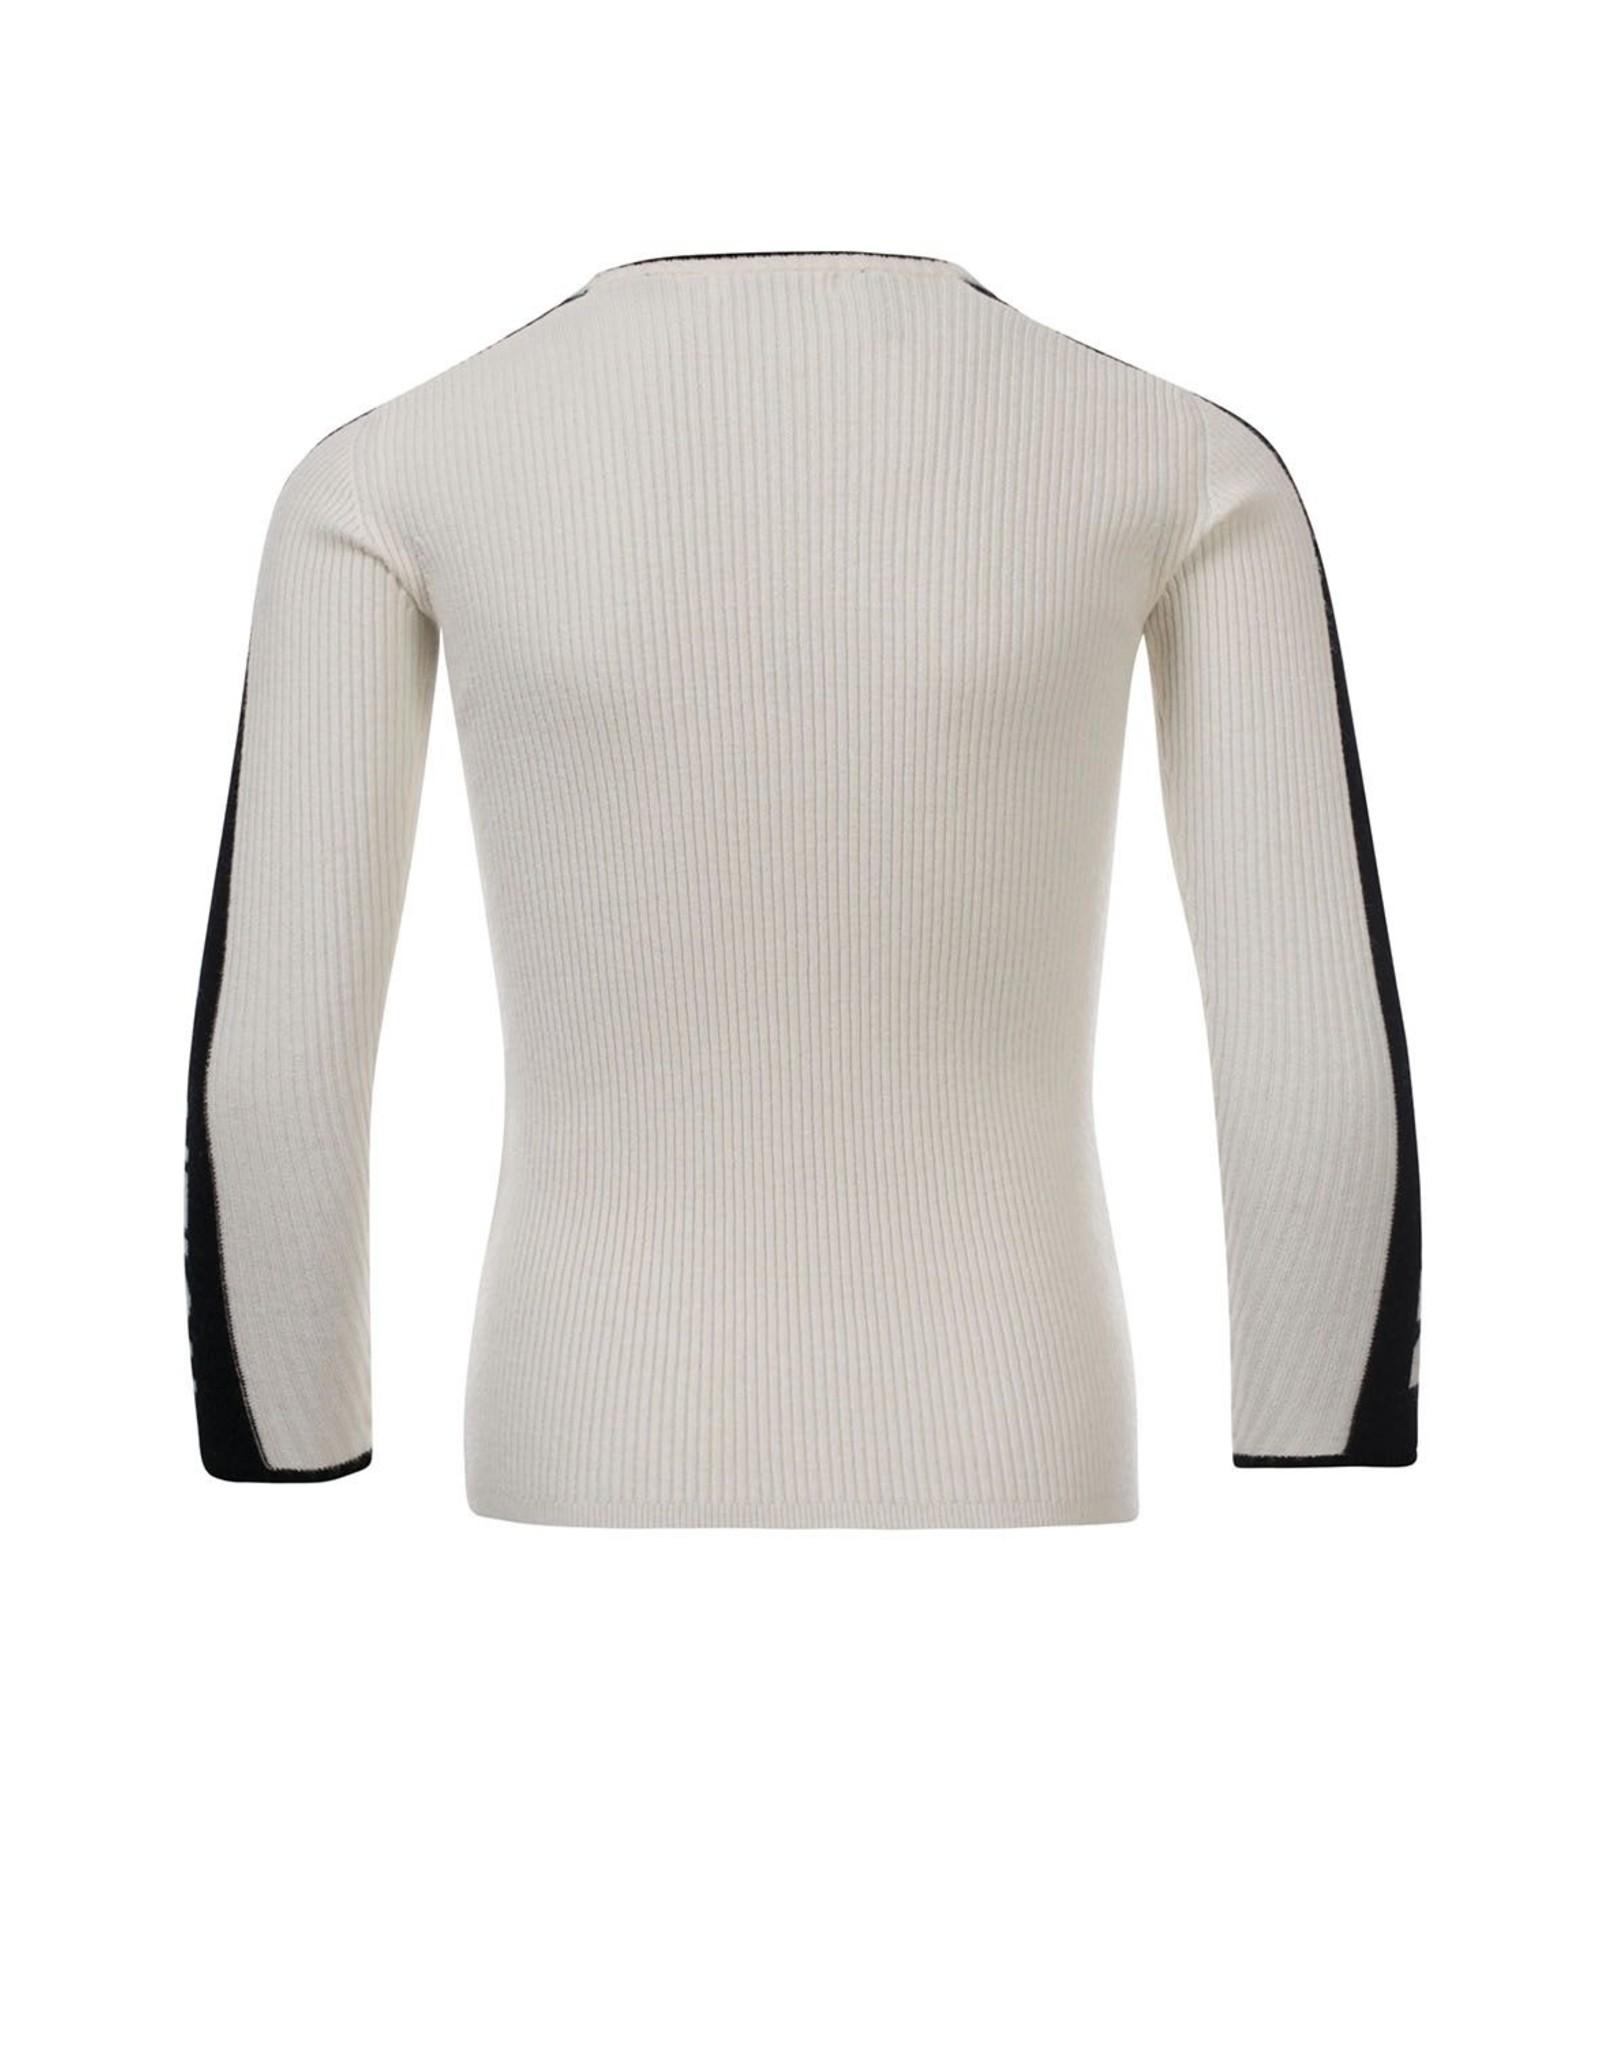 Looxs 10SIXTEEN 10Sixteen knited pullover1